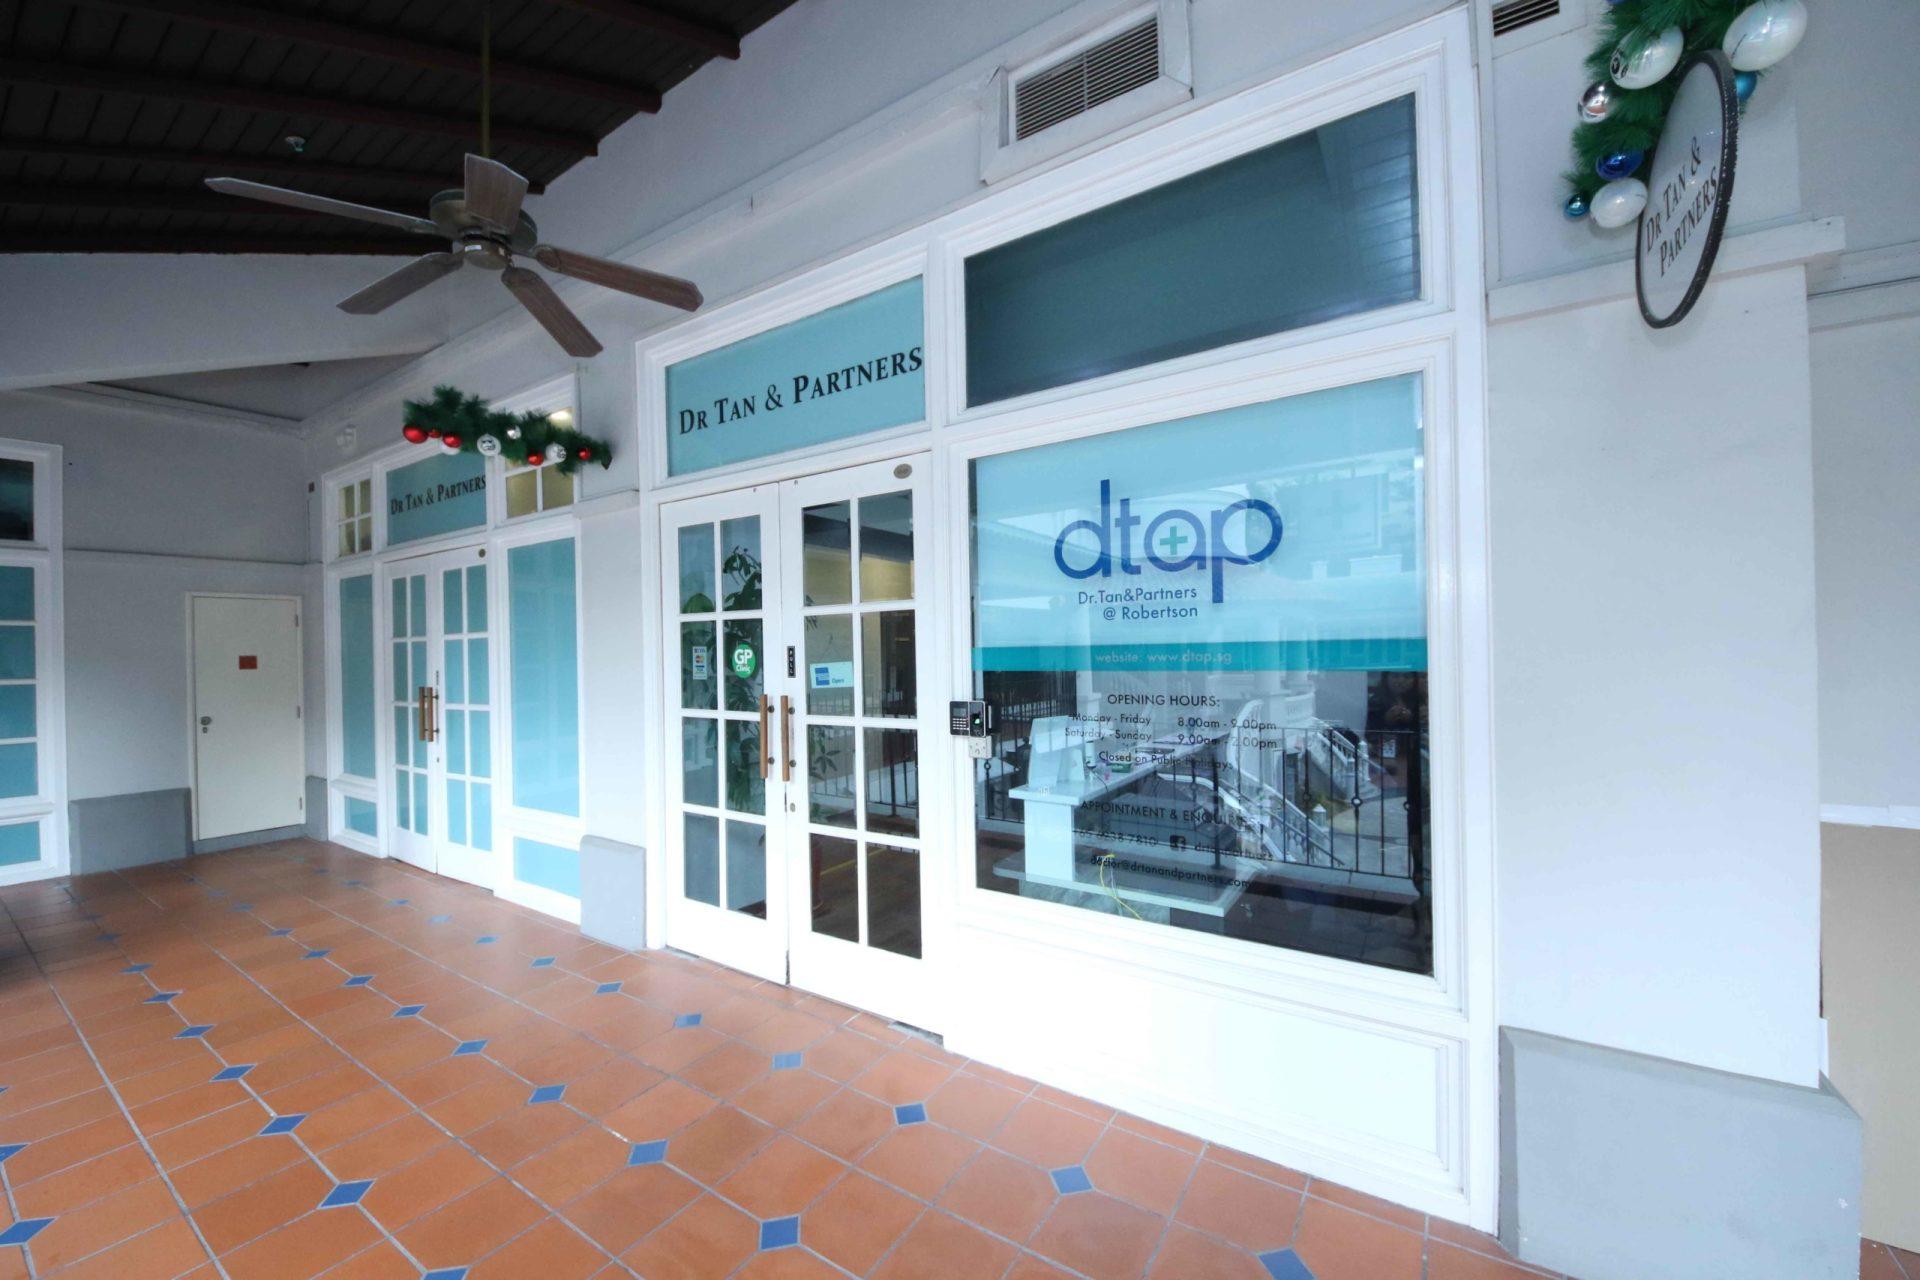 DTAP Clinic @ Robertson